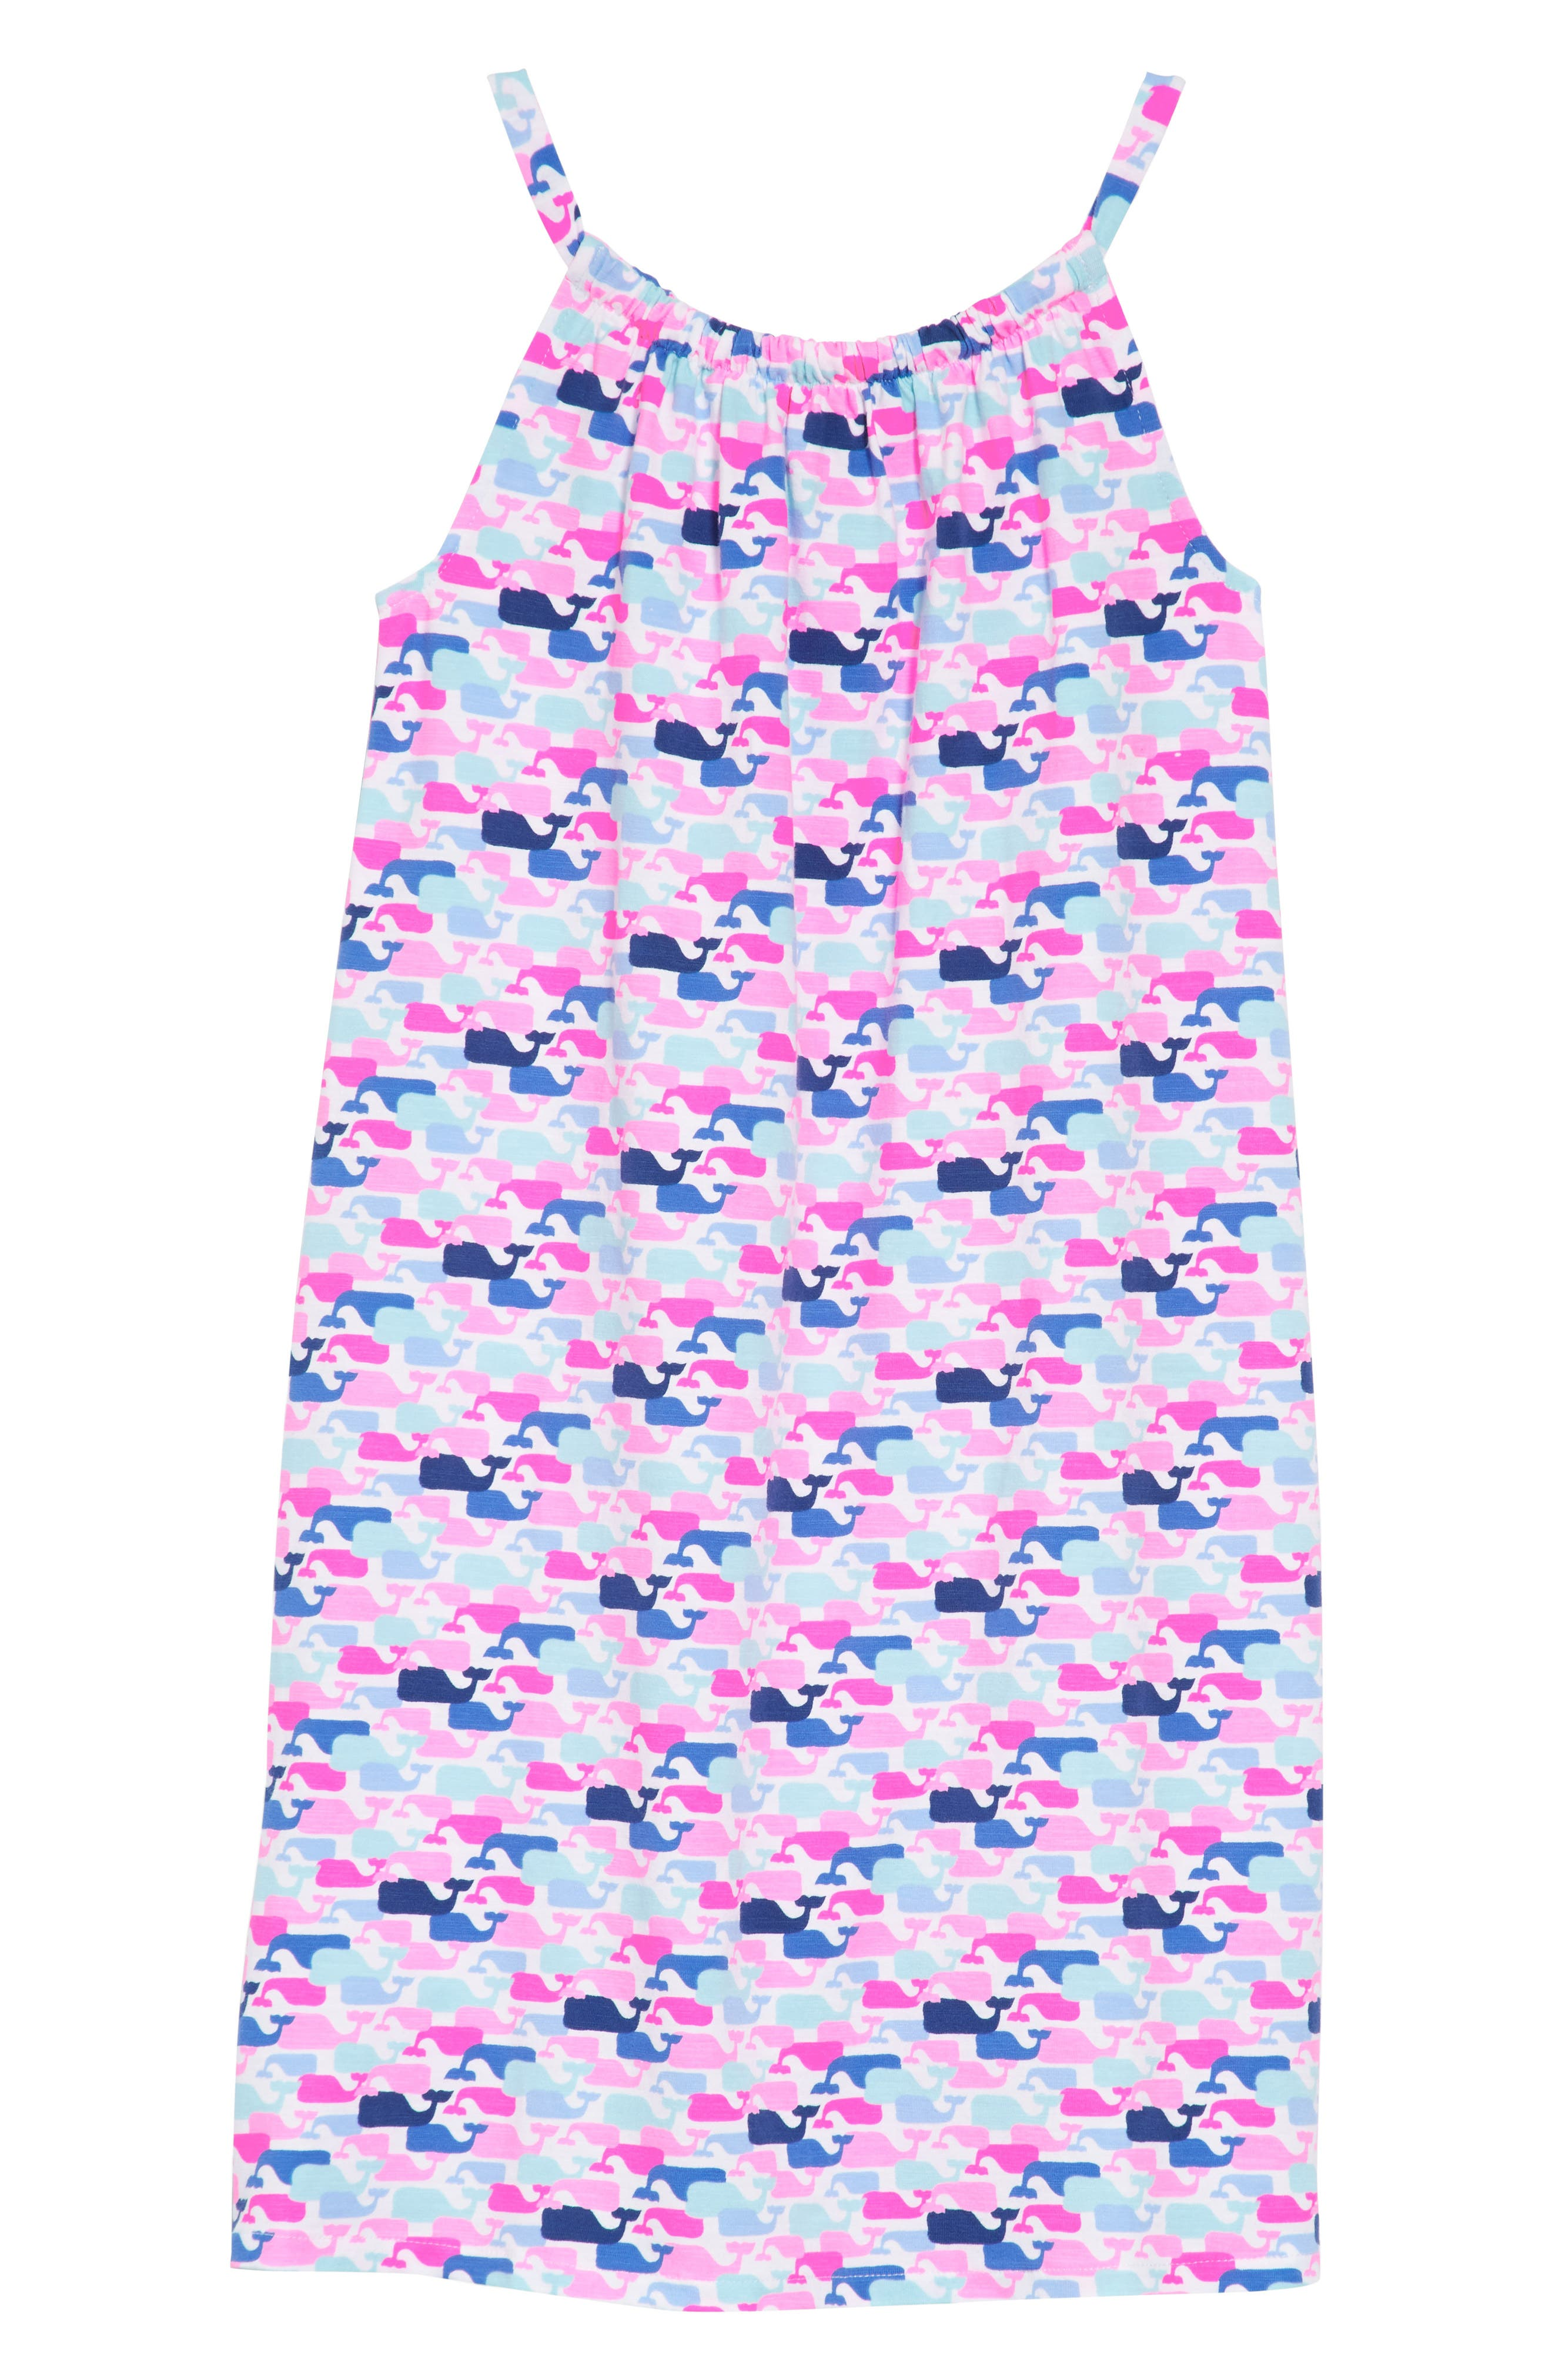 Whale Print Dress,                             Main thumbnail 1, color,                             White Cap